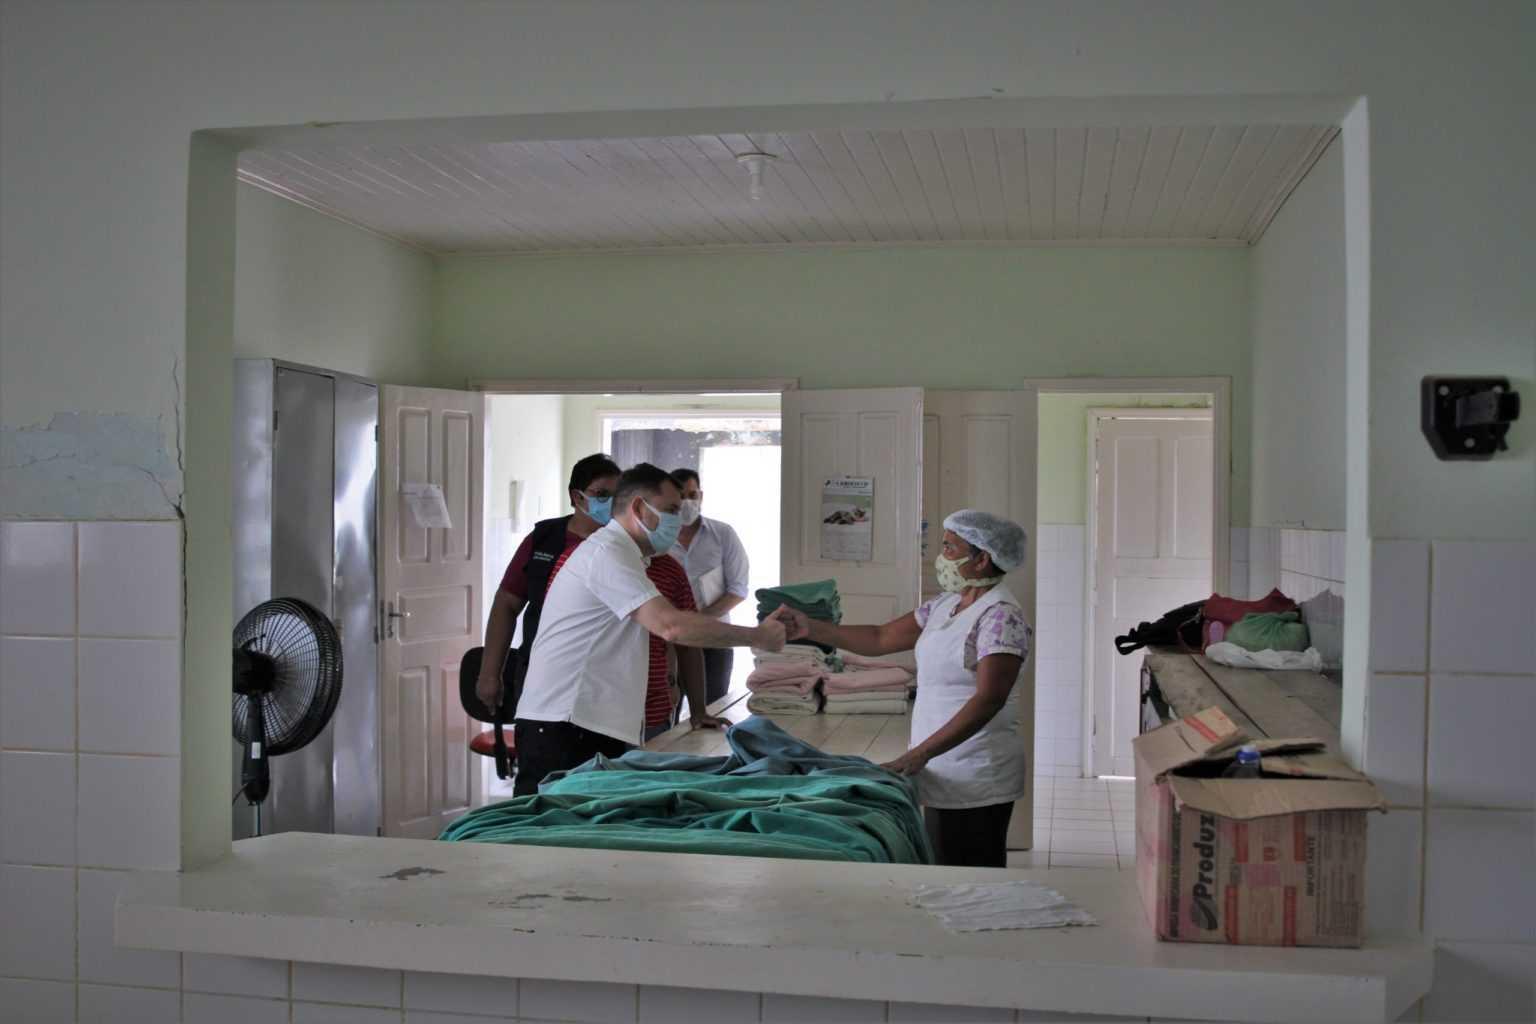 Alysson-Bestene-visita-Hospital-de-Xapuri.-Odair-Leal-10-scaled-1-1536×1024